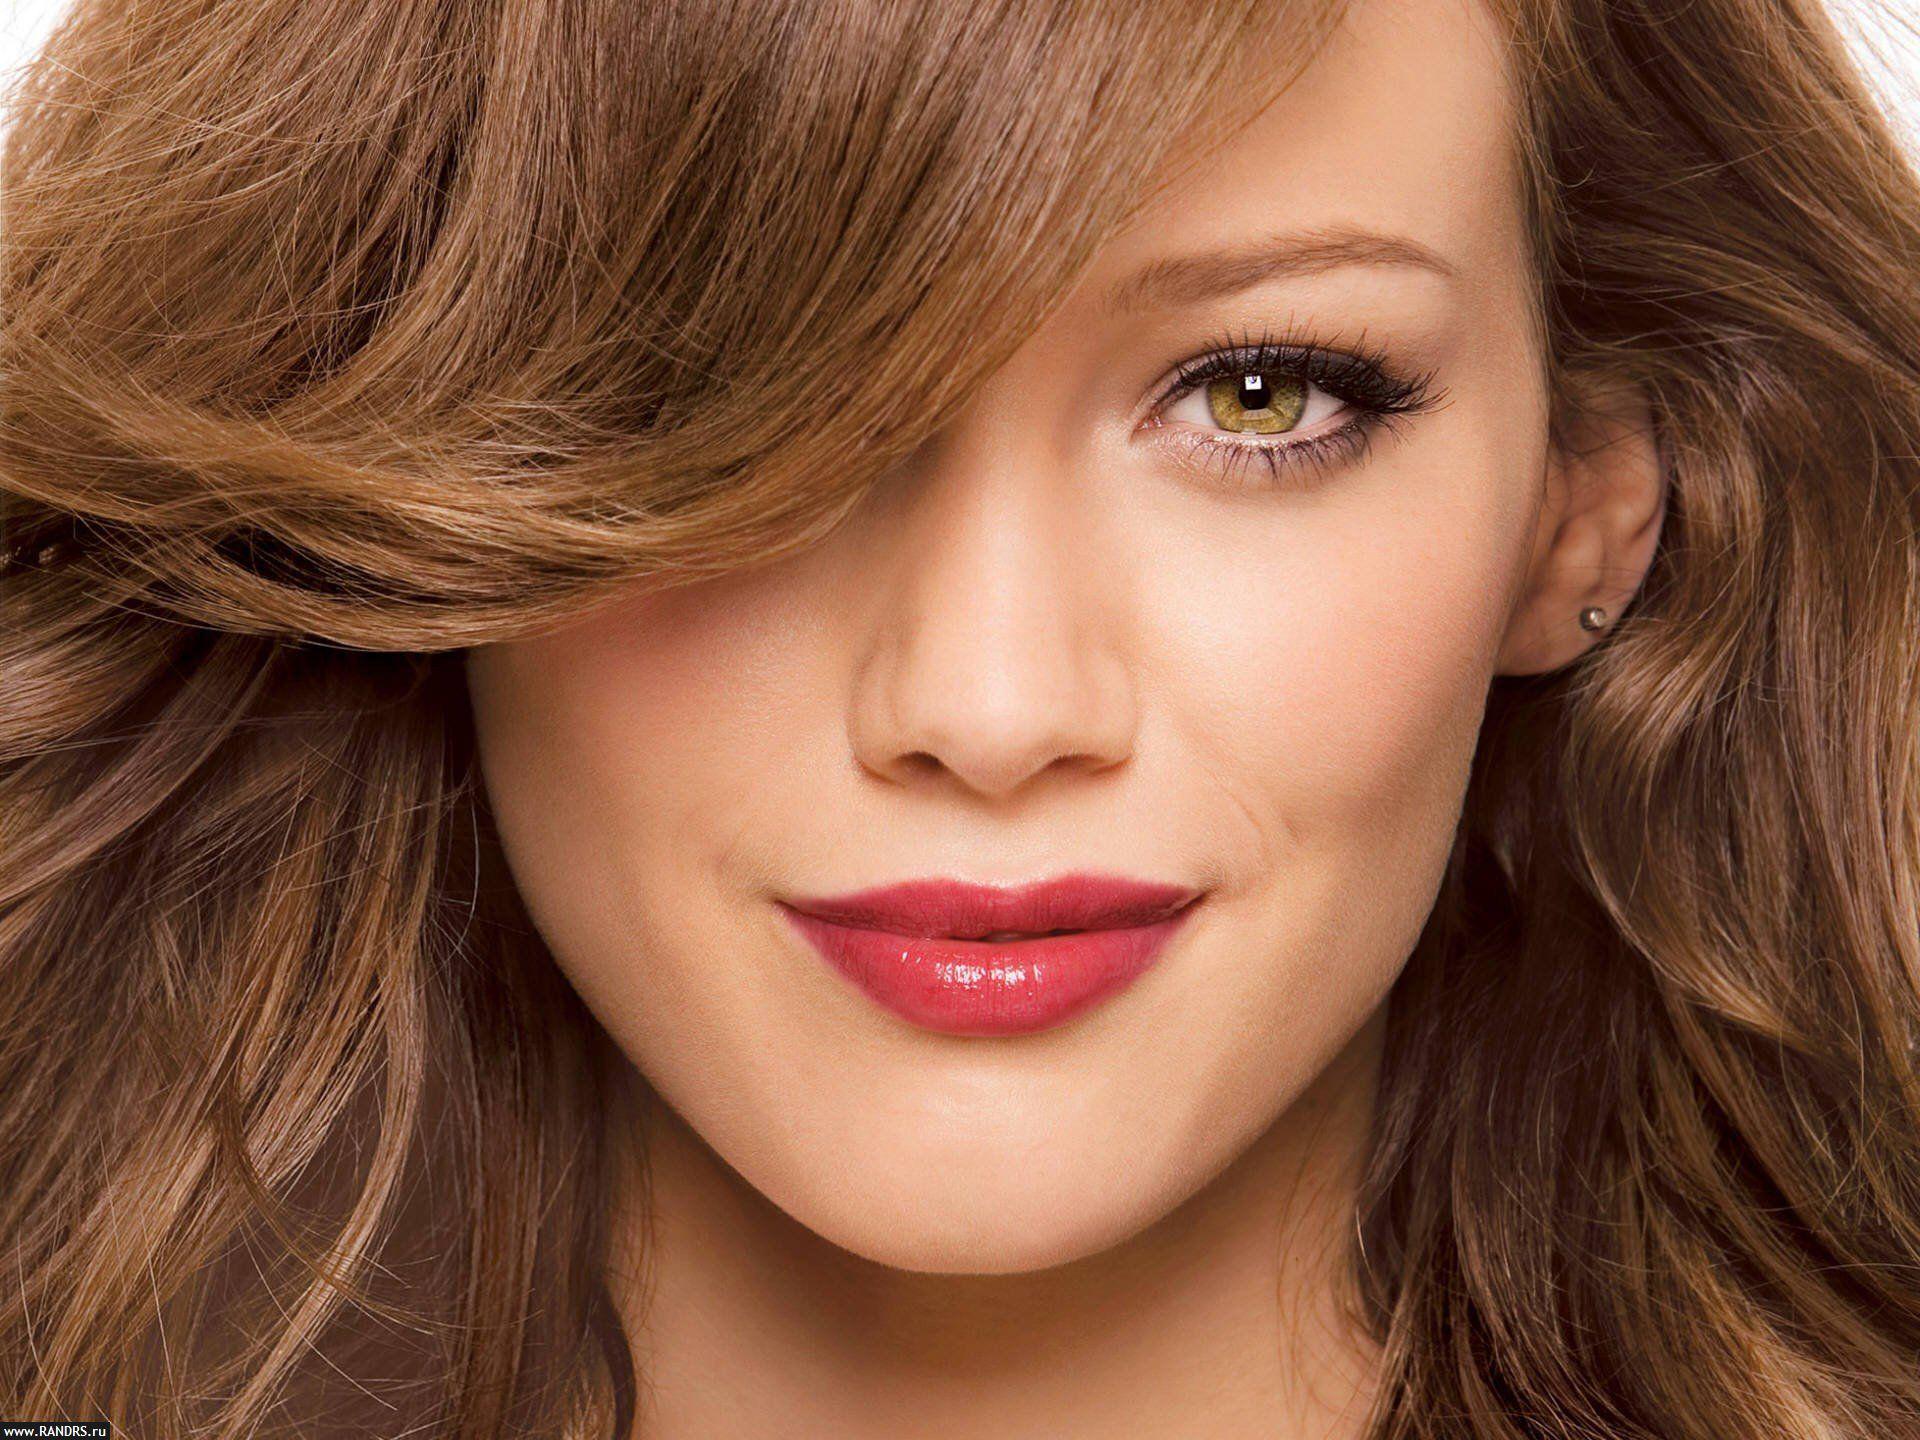 girls-wallpapers-beautiful-women-faces-wallpaper-36101